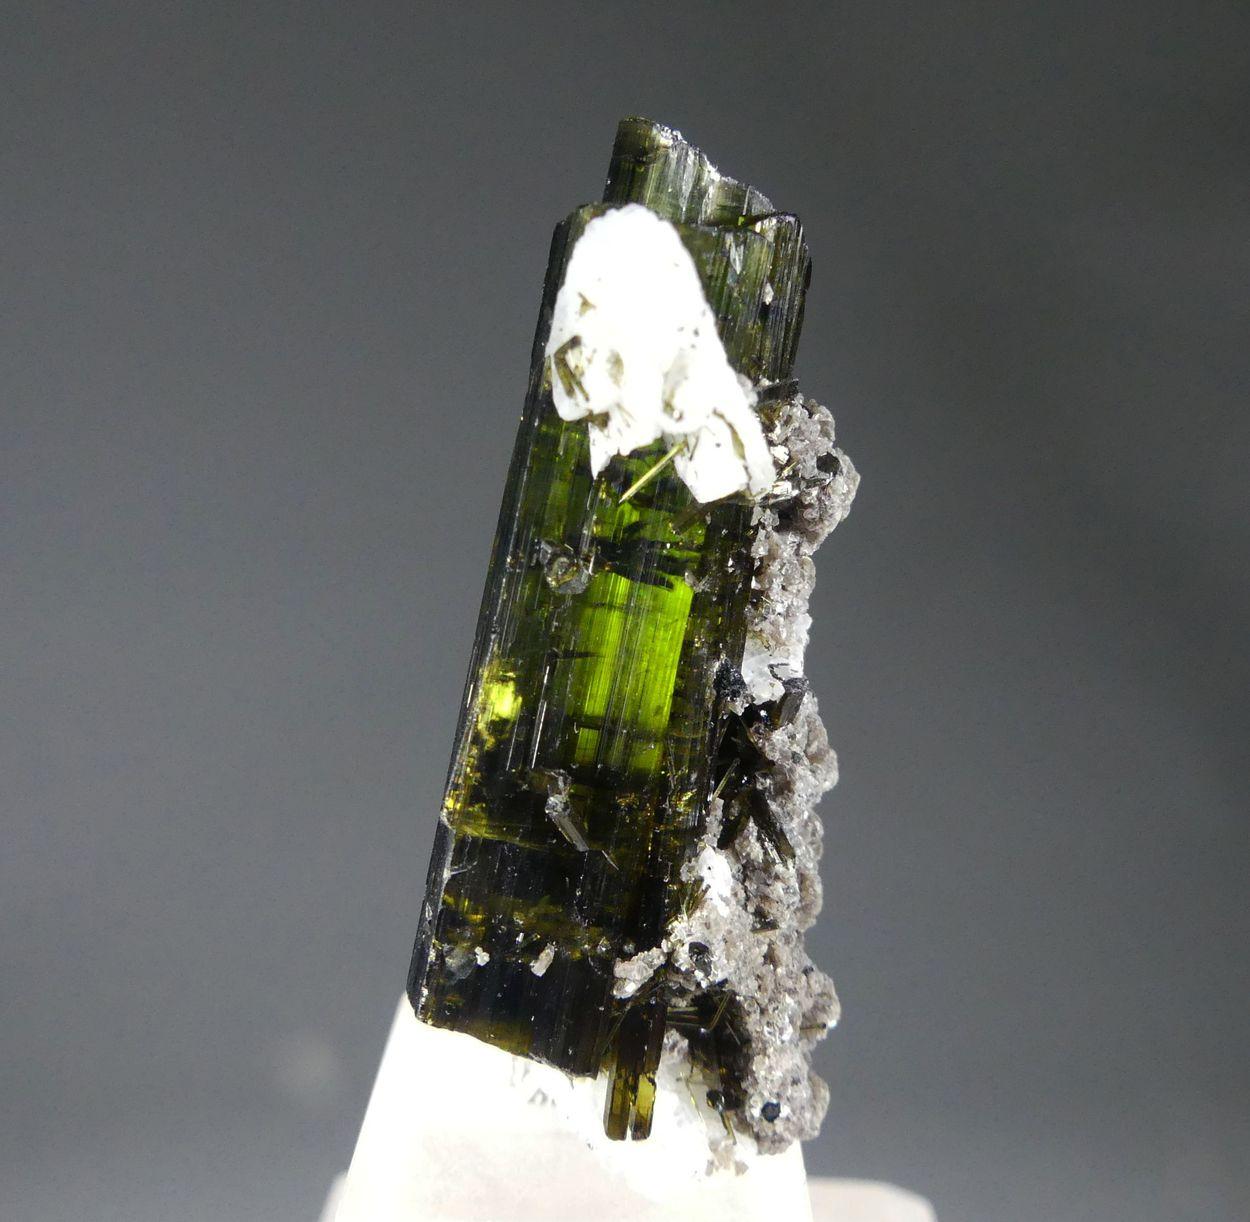 Tourmaline Var Verdelite With Lepidolite & Cleavelandite